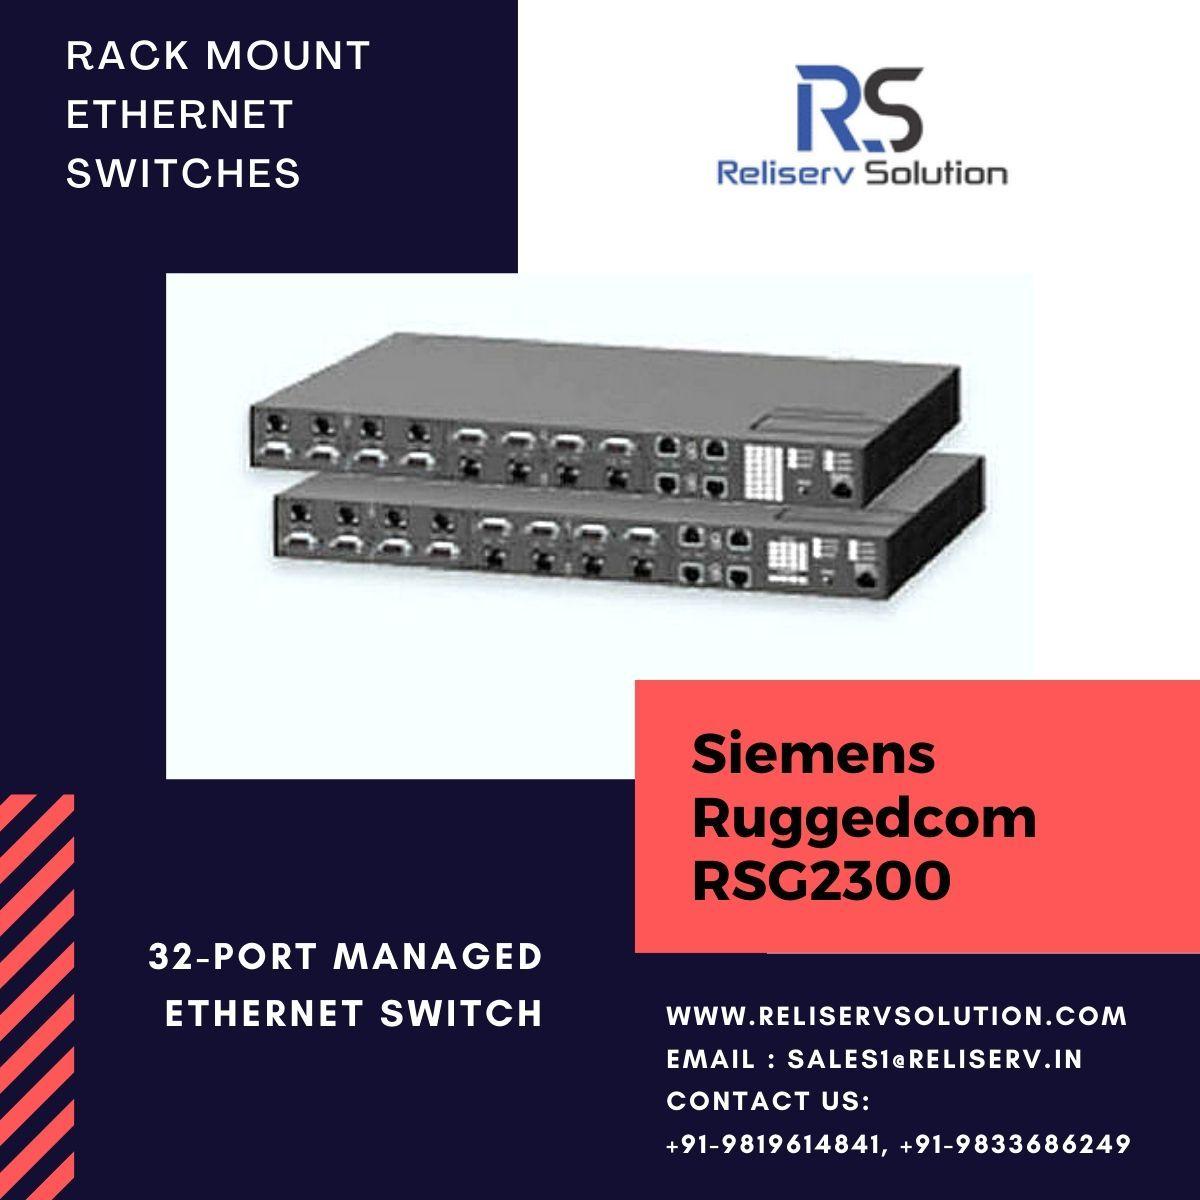 siemens ruggedcom rsg2300 rack mount